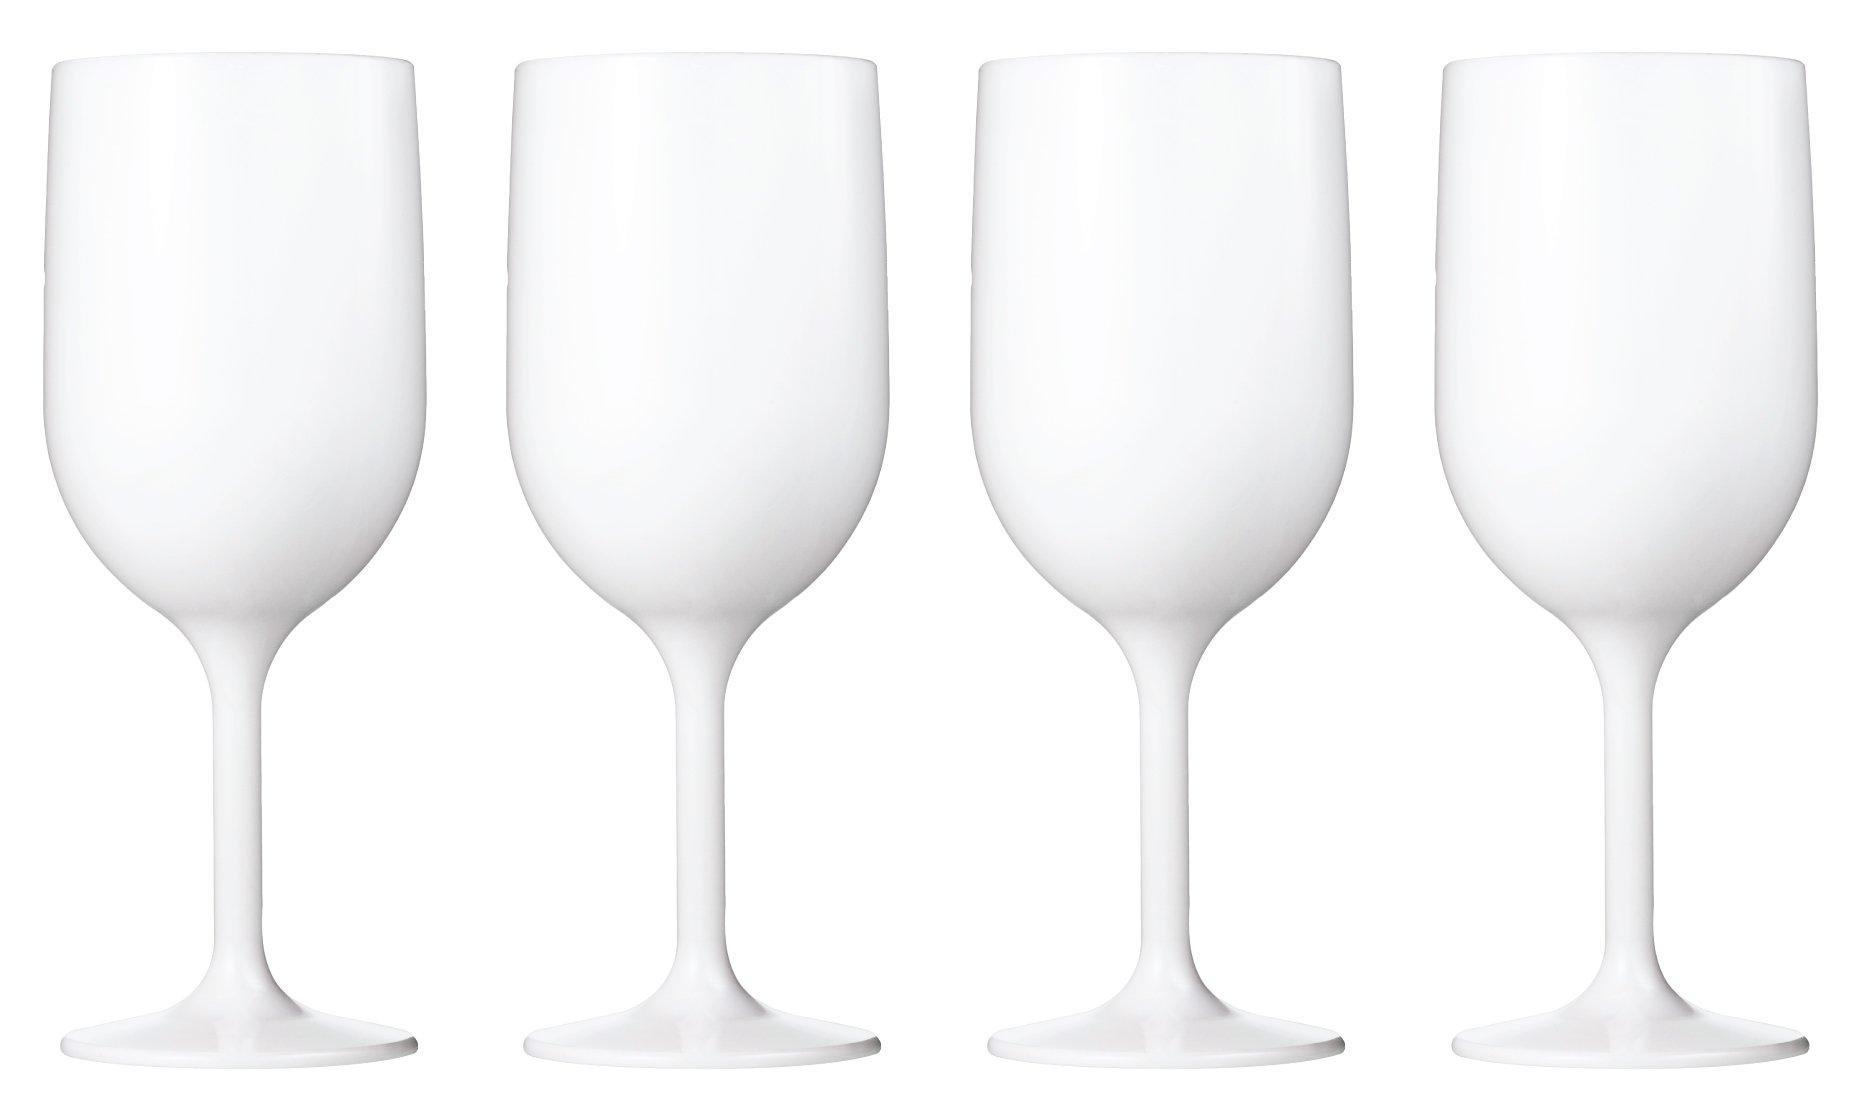 Drinique VIN-WG-WHT-4 Stemmed Wine Glass Unbreakable Tritan Stemware, 12 oz (Set of 4), White